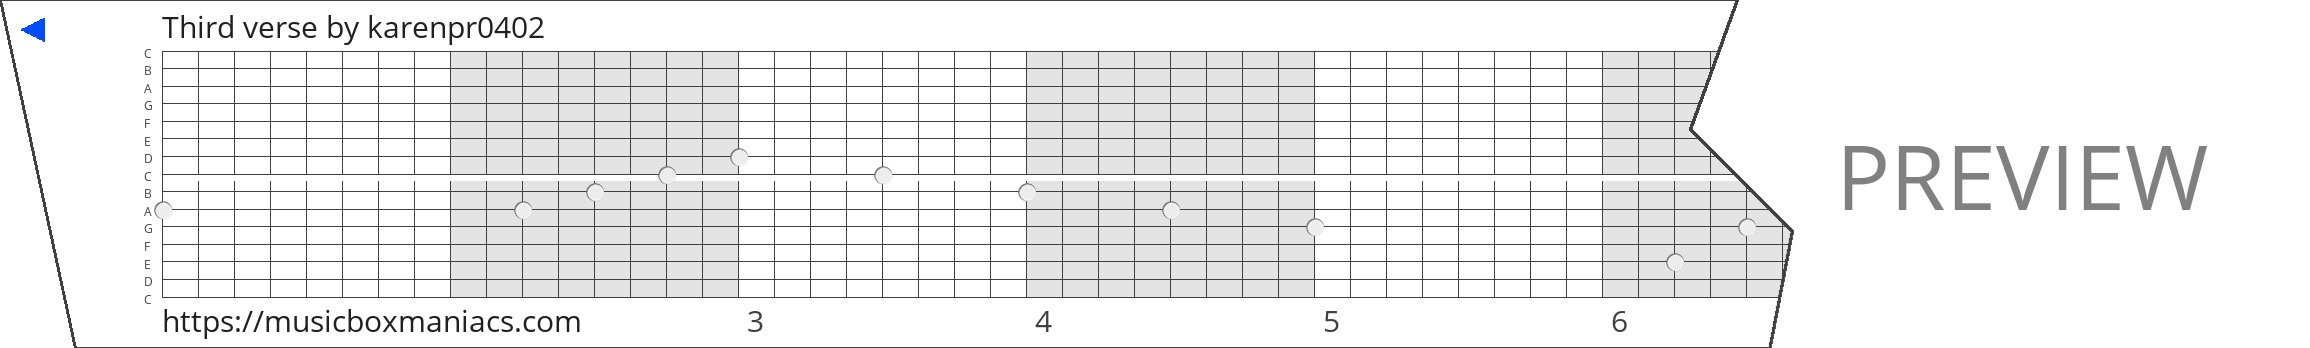 Third verse 15 note music box paper strip